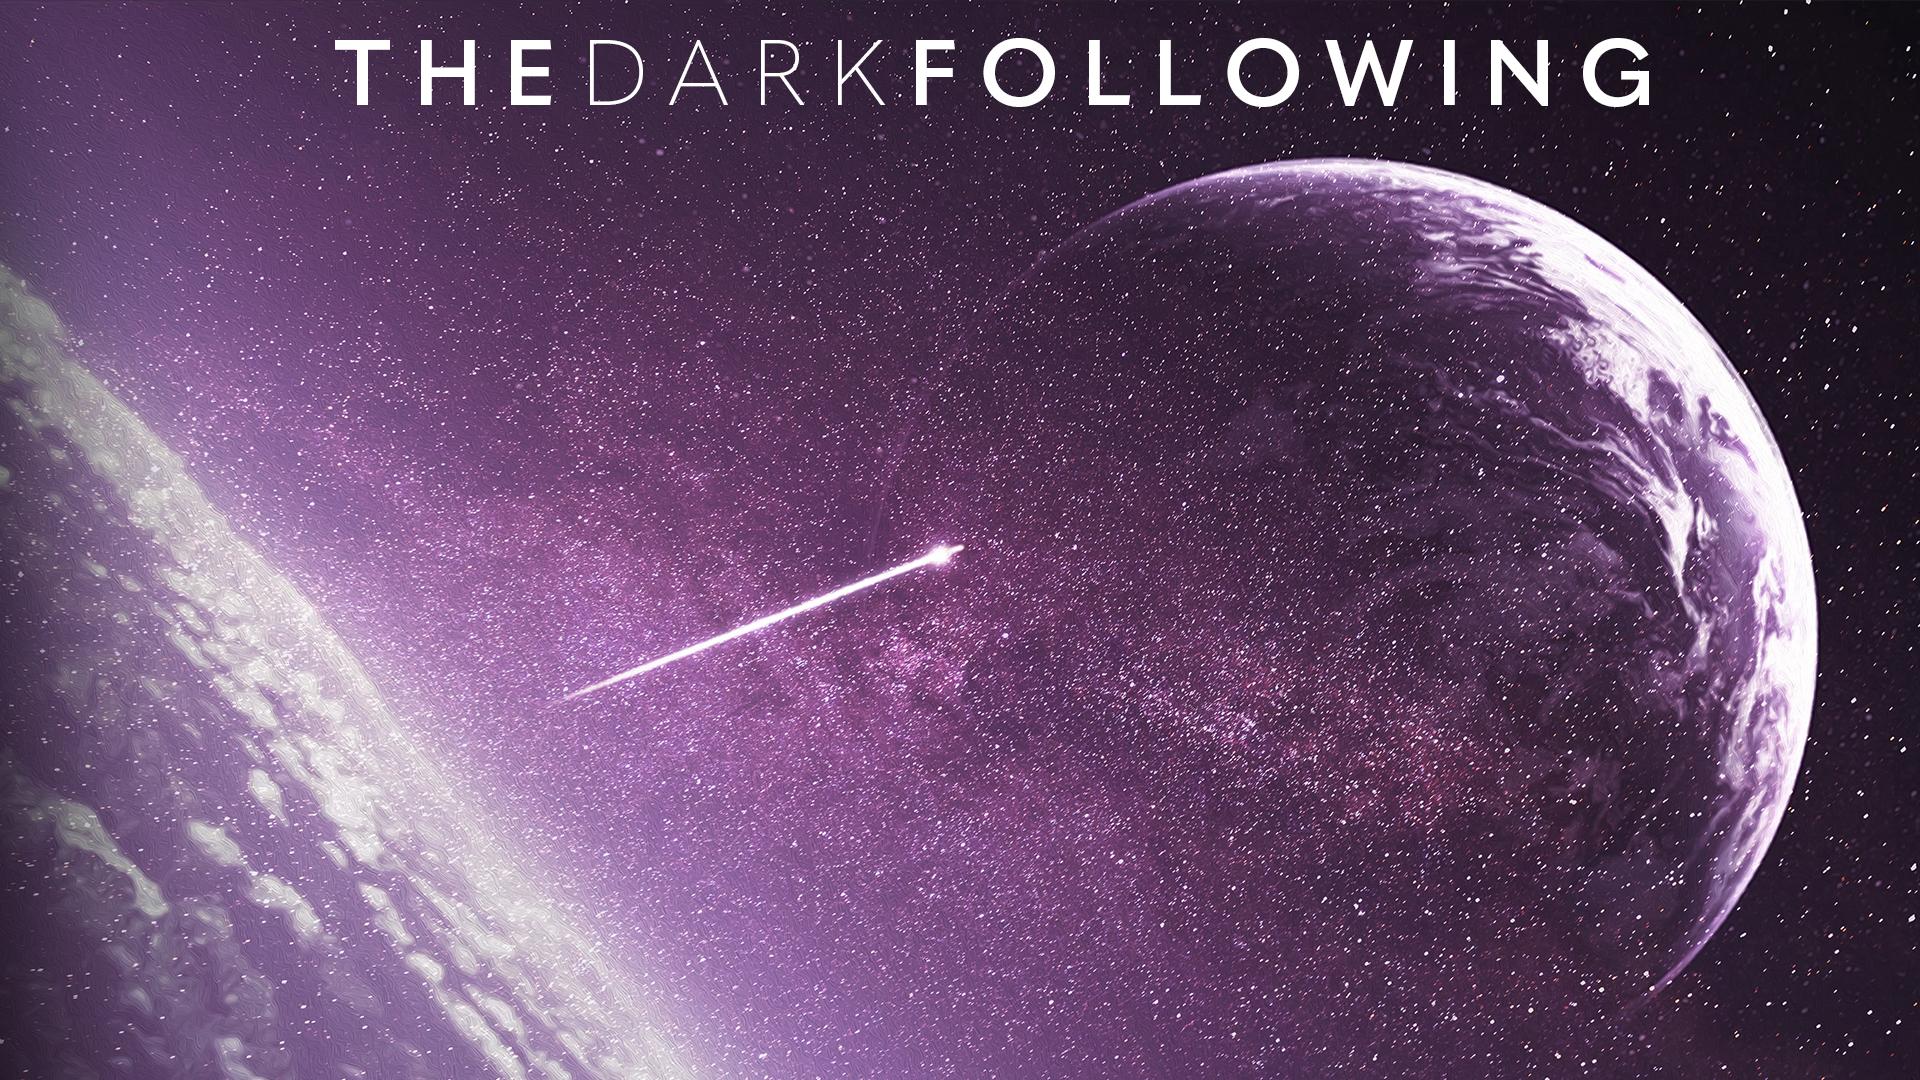 The Dark Following